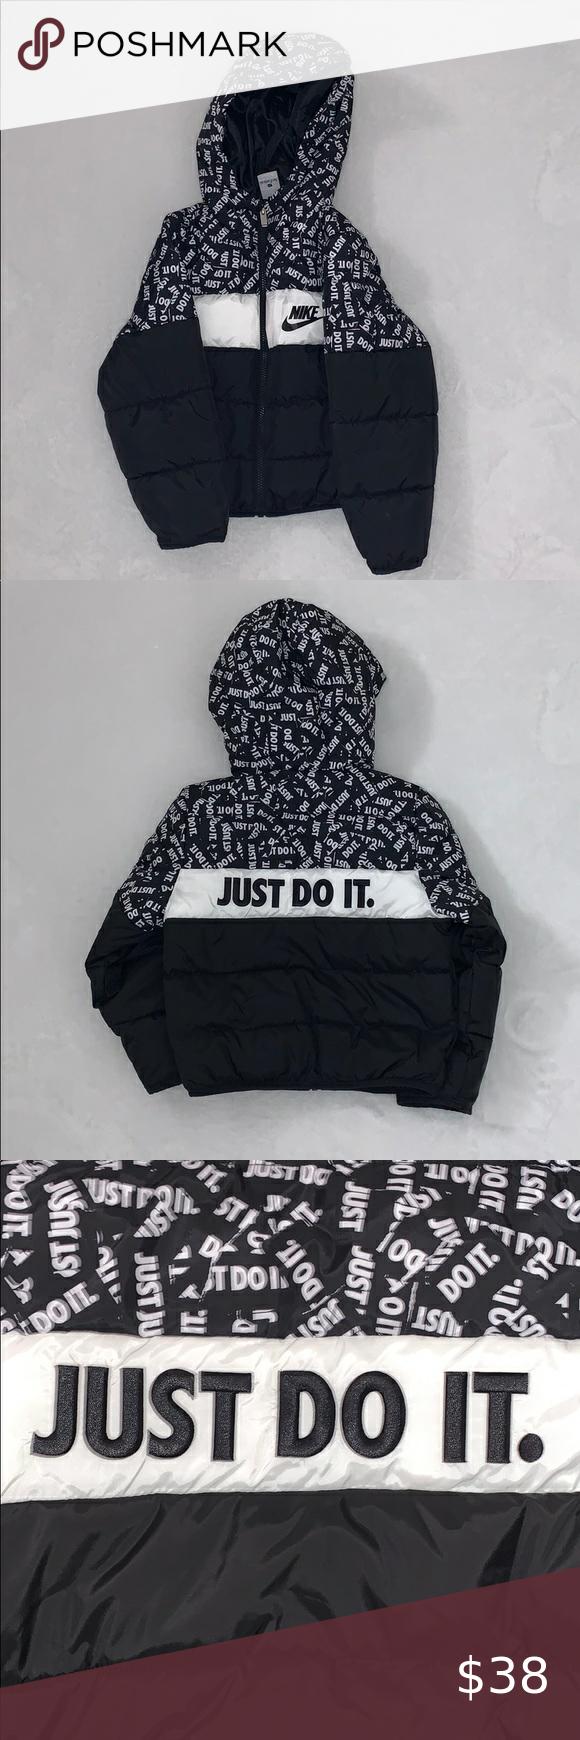 Nike Puffer Kids Jacket New Without Tag Nike Jackets Coats Puffers Nike Coat Kids Jacket Baby Girl Jackets [ 1740 x 580 Pixel ]